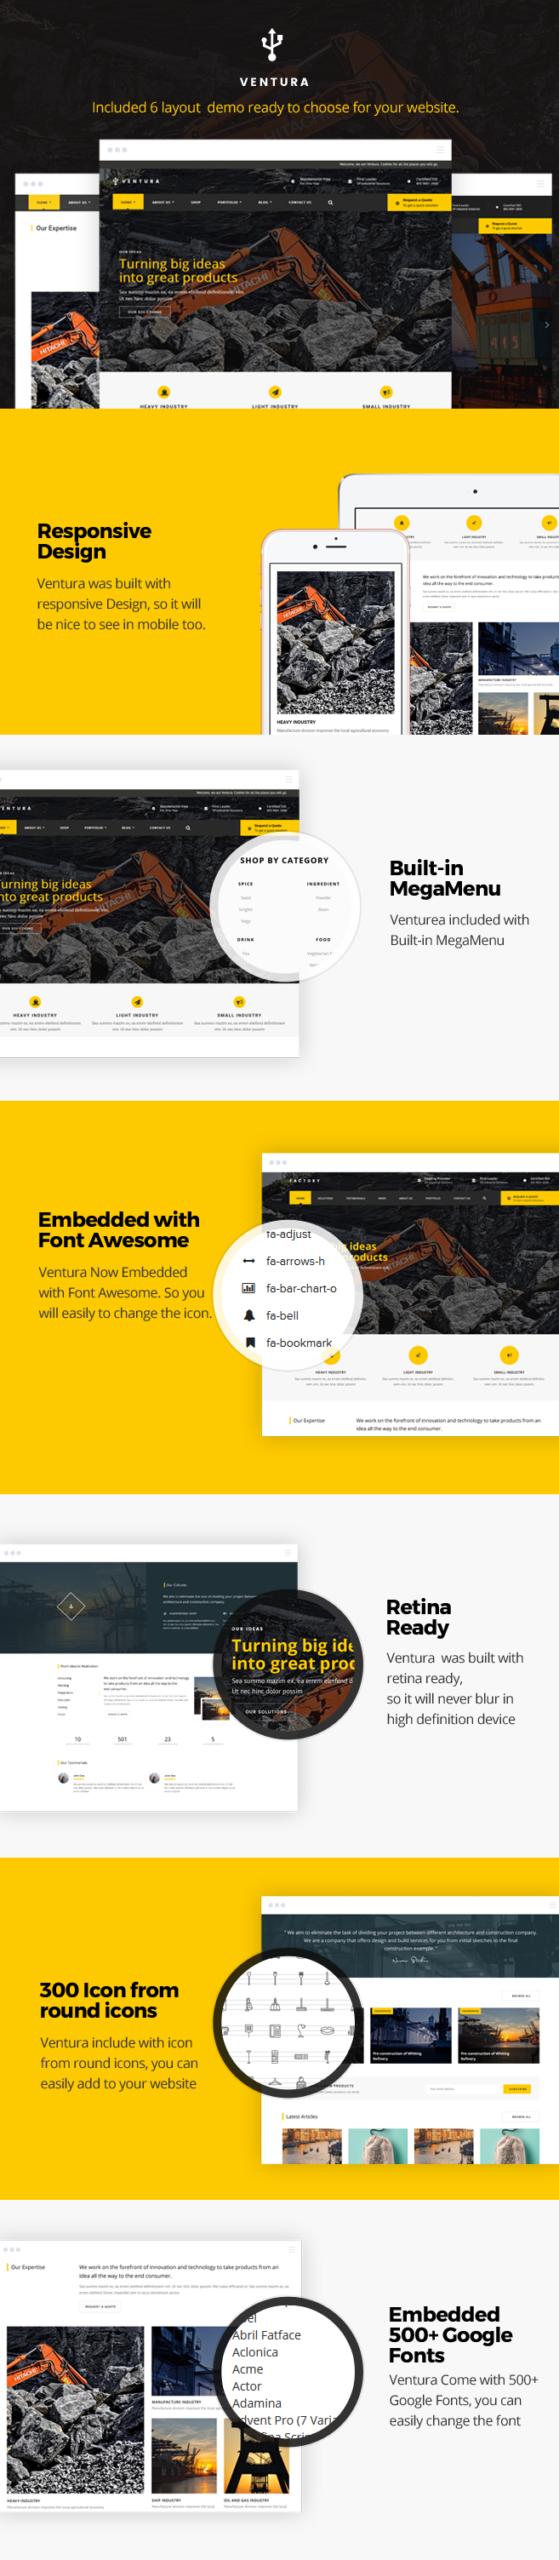 Wordpress Corporate Template Ventura - Industrial WordPress Theme